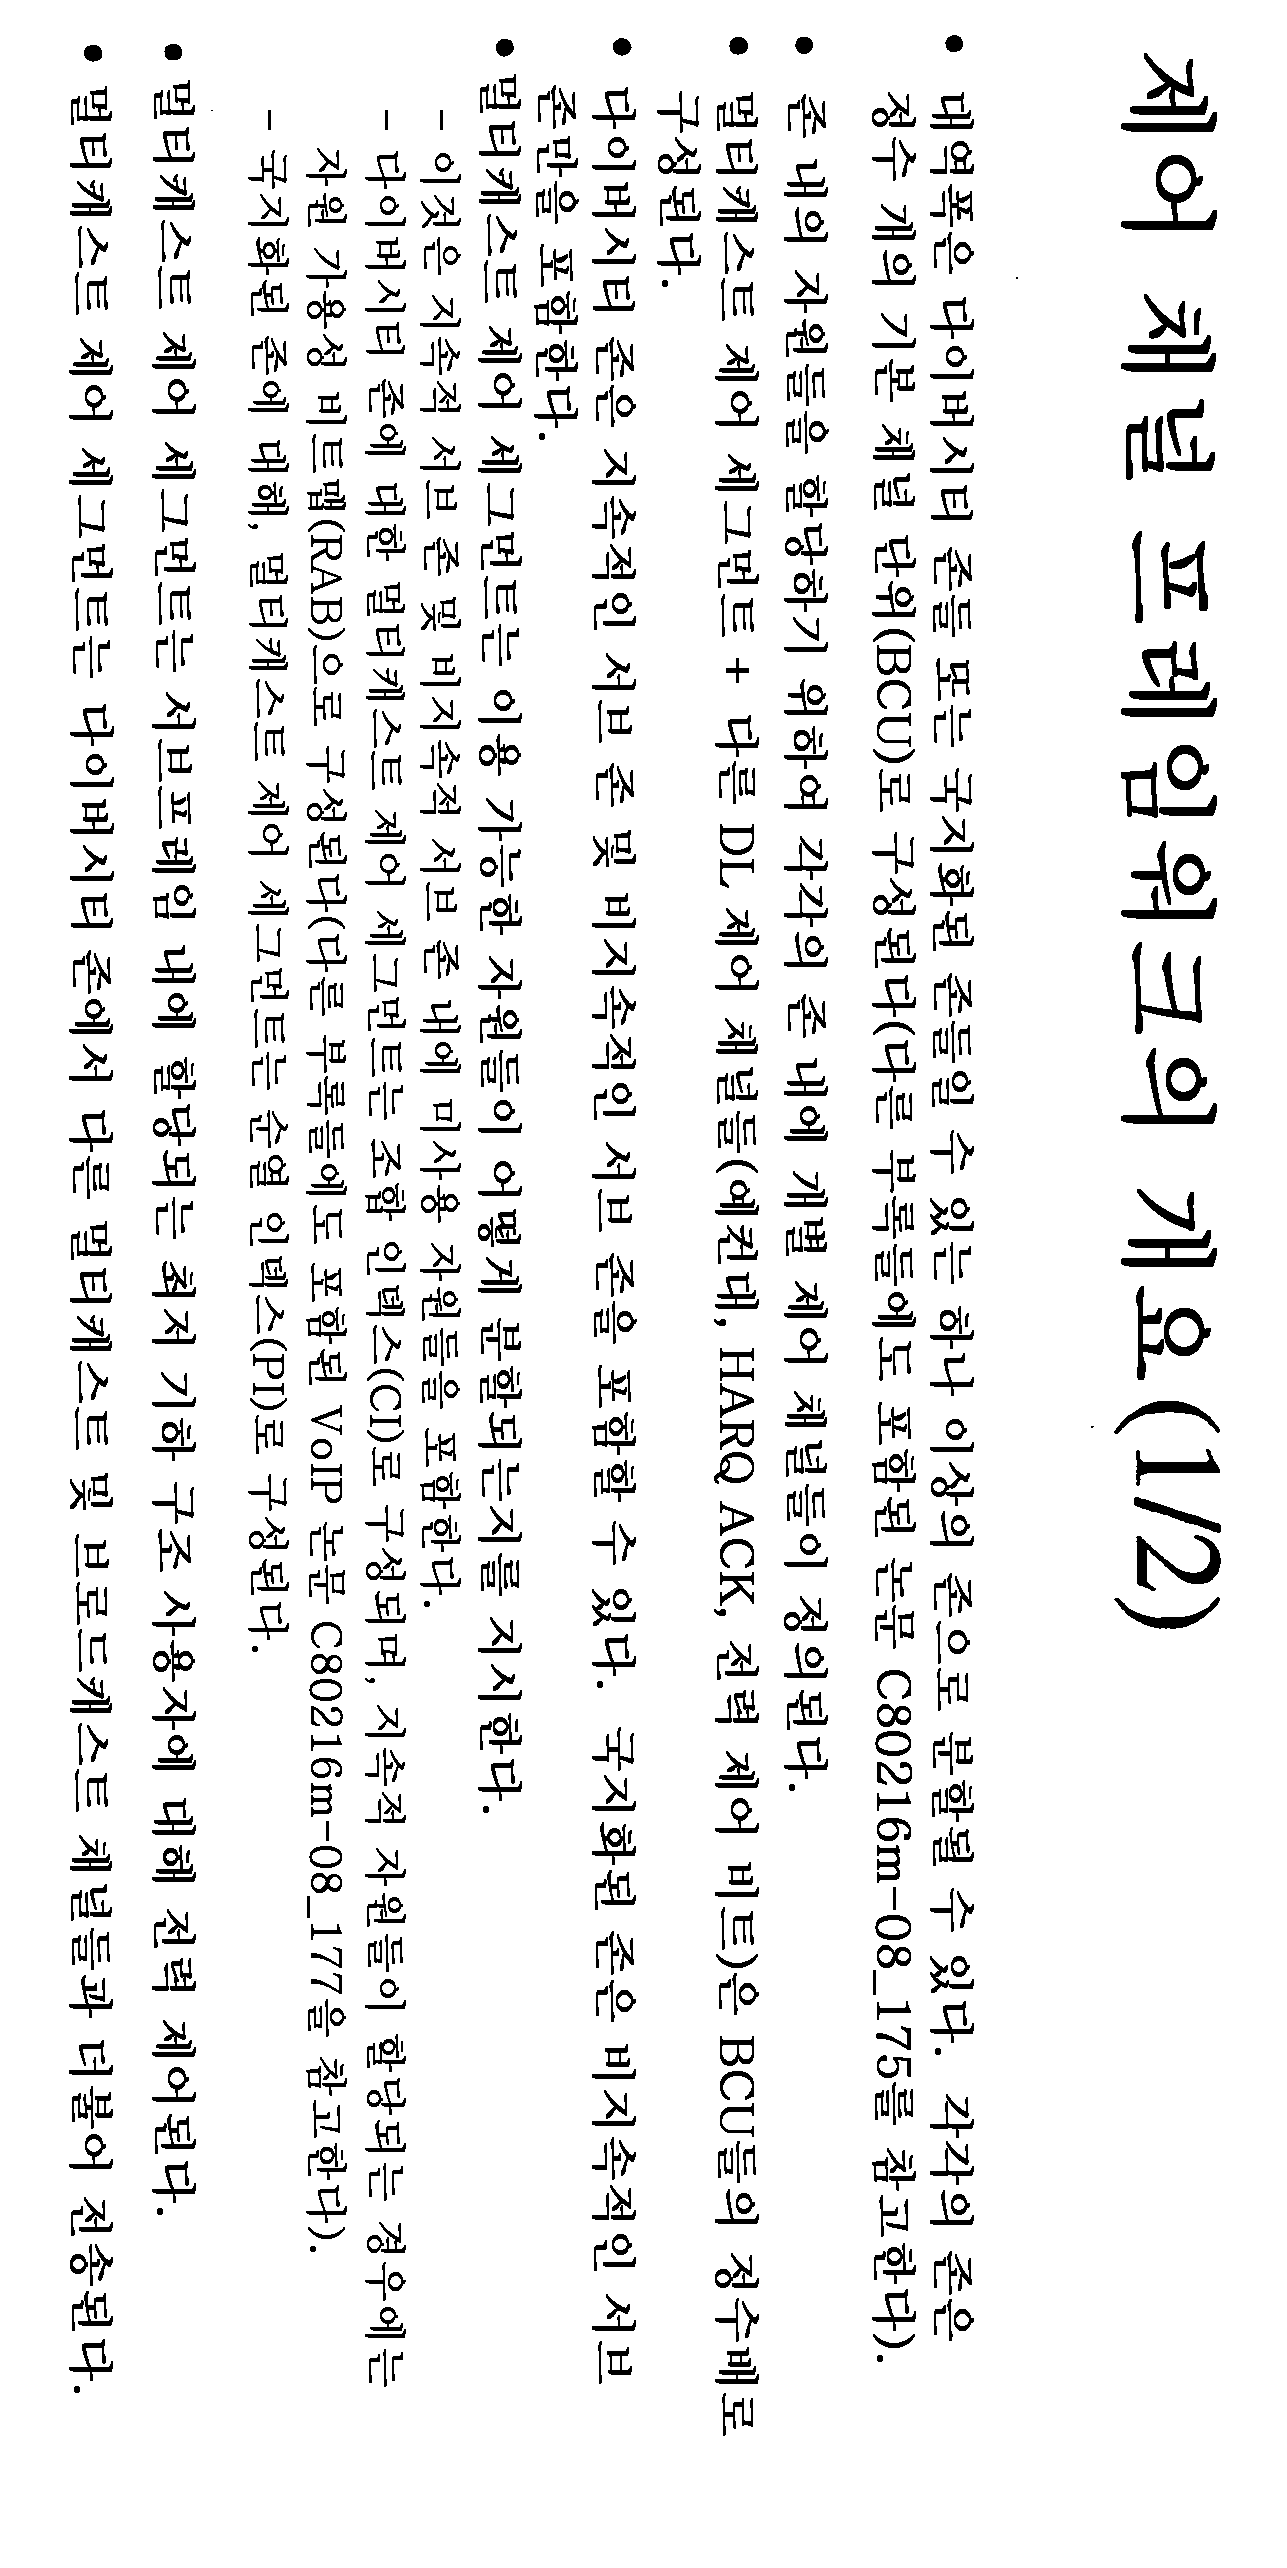 Figure 112016018236900-pat00028